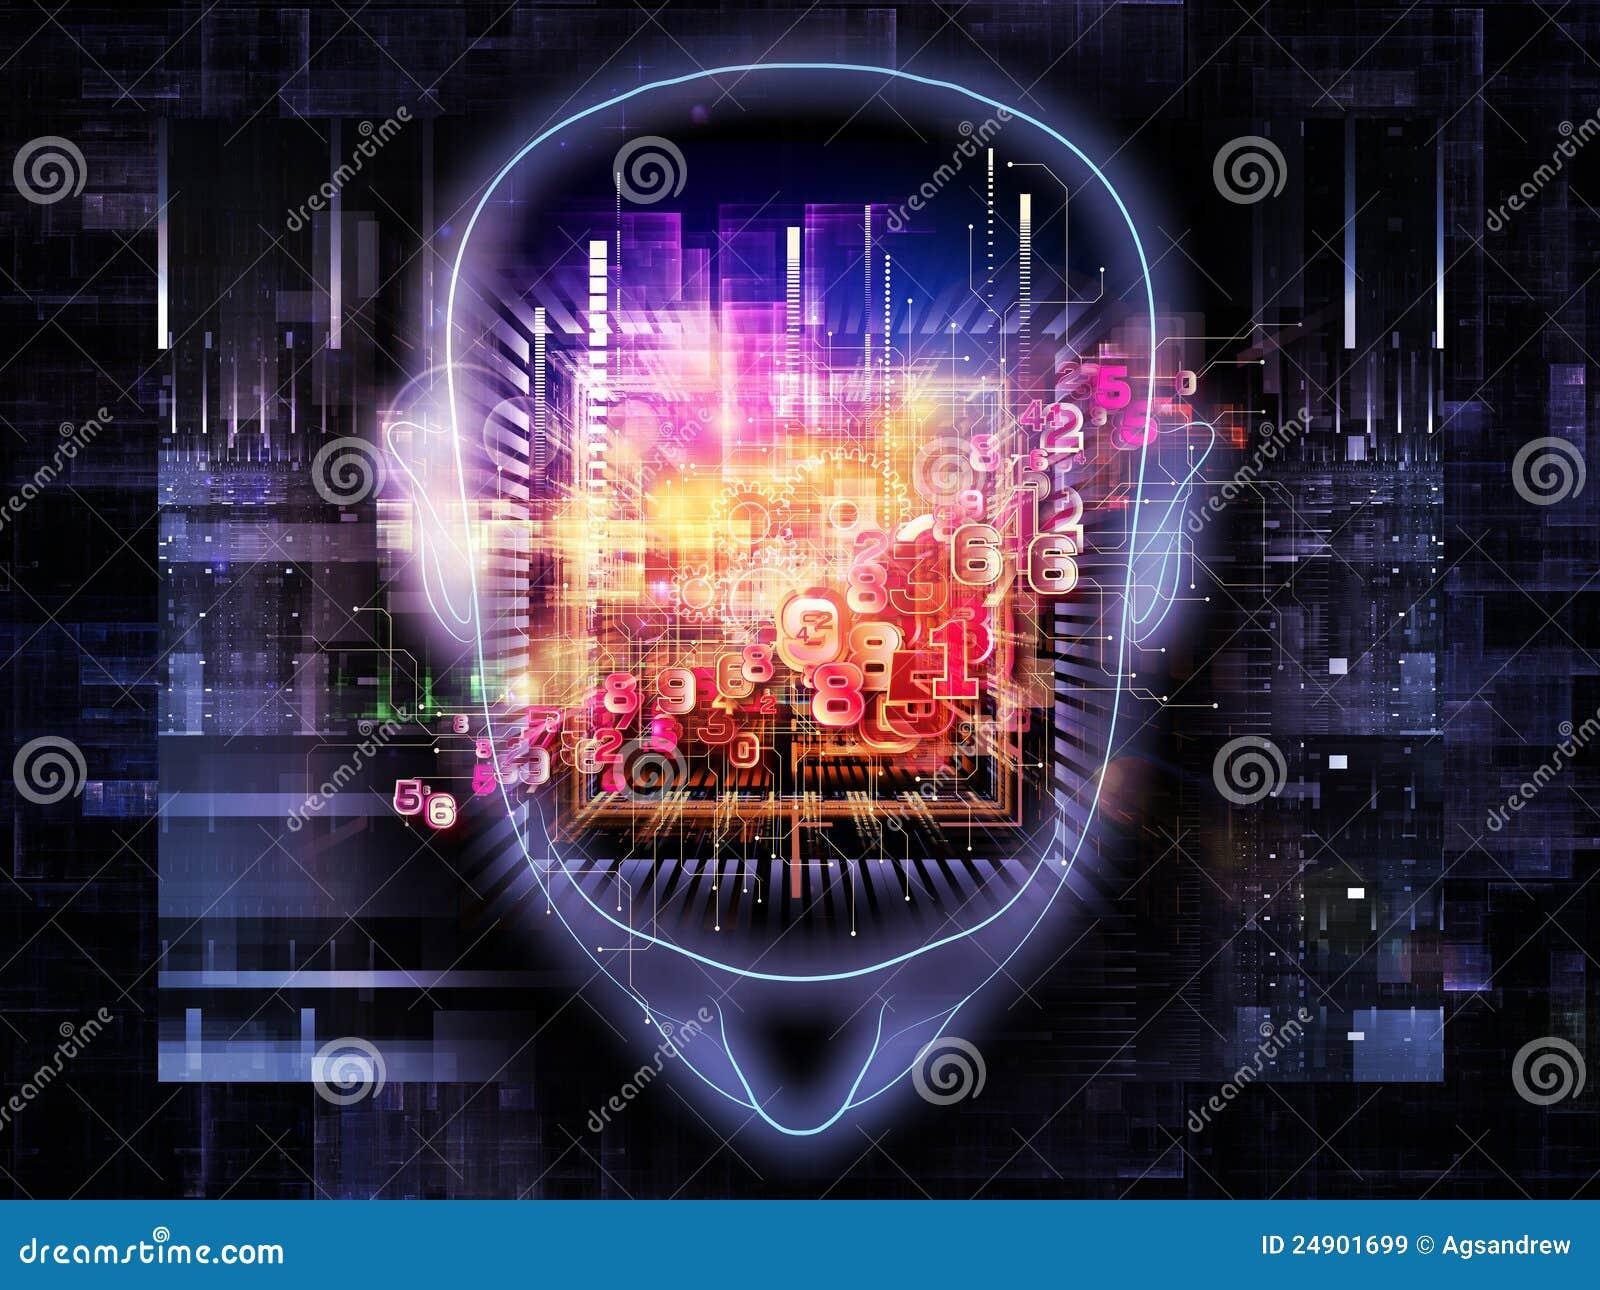 brain power stock illustration  image of graphic  chip